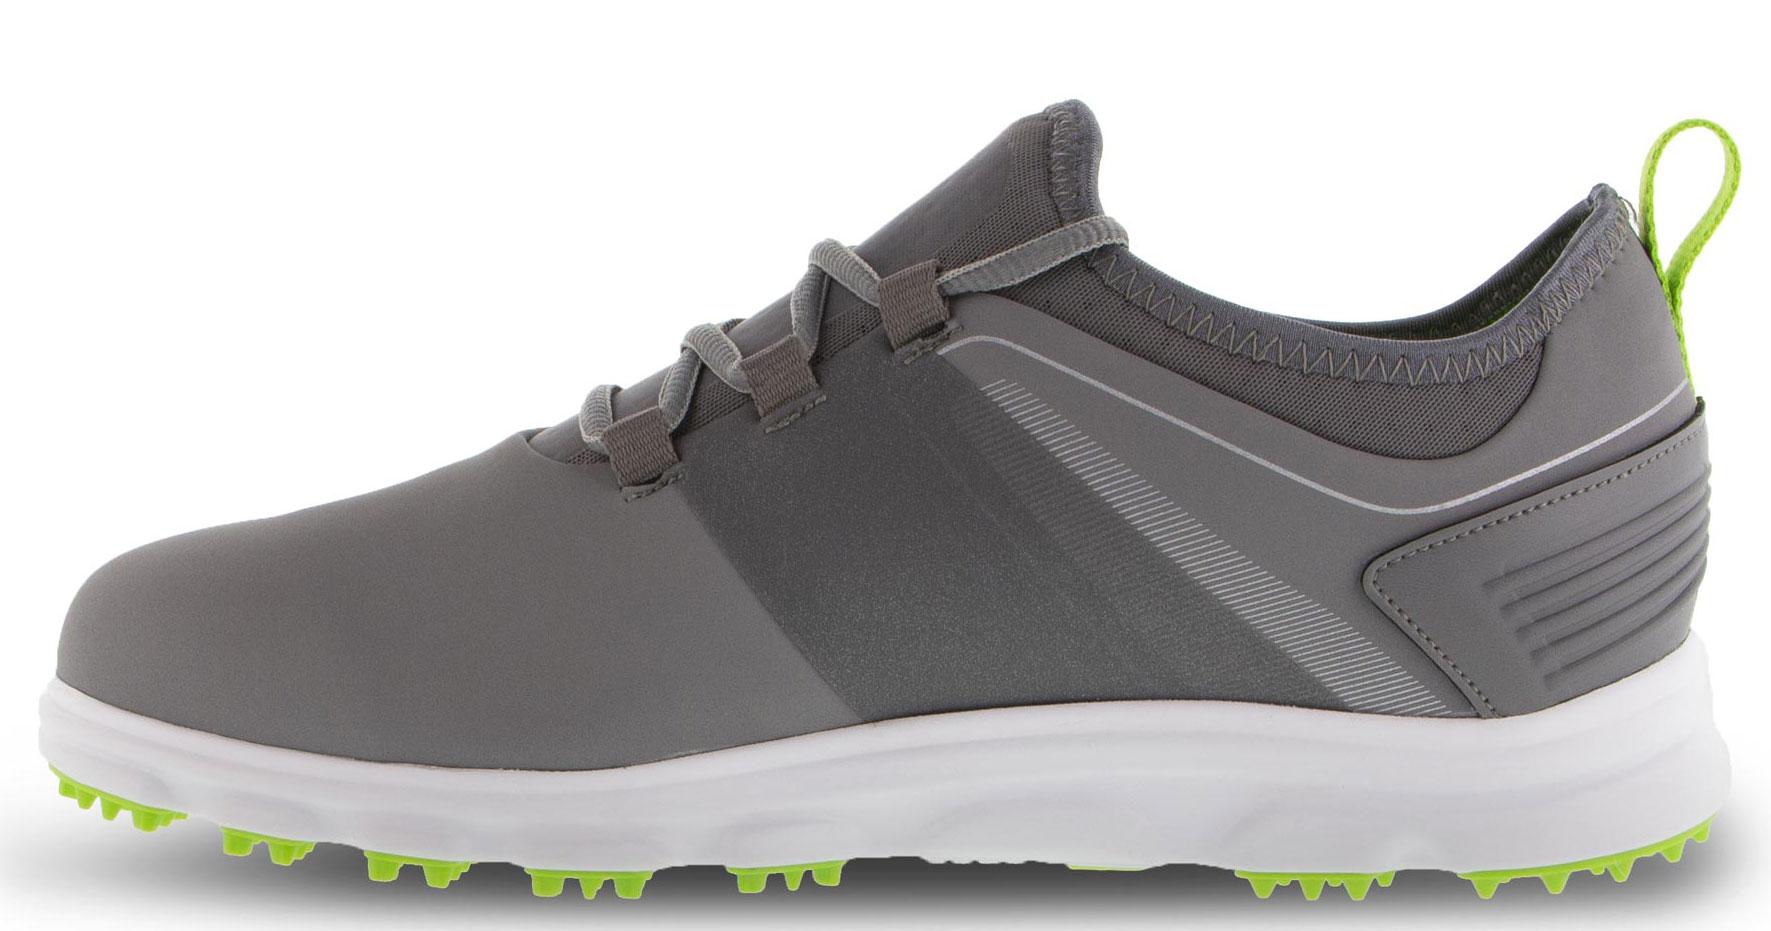 FootJoy-Superlites-XP-Golf-Shoes-Men-039-s-New thumbnail 8